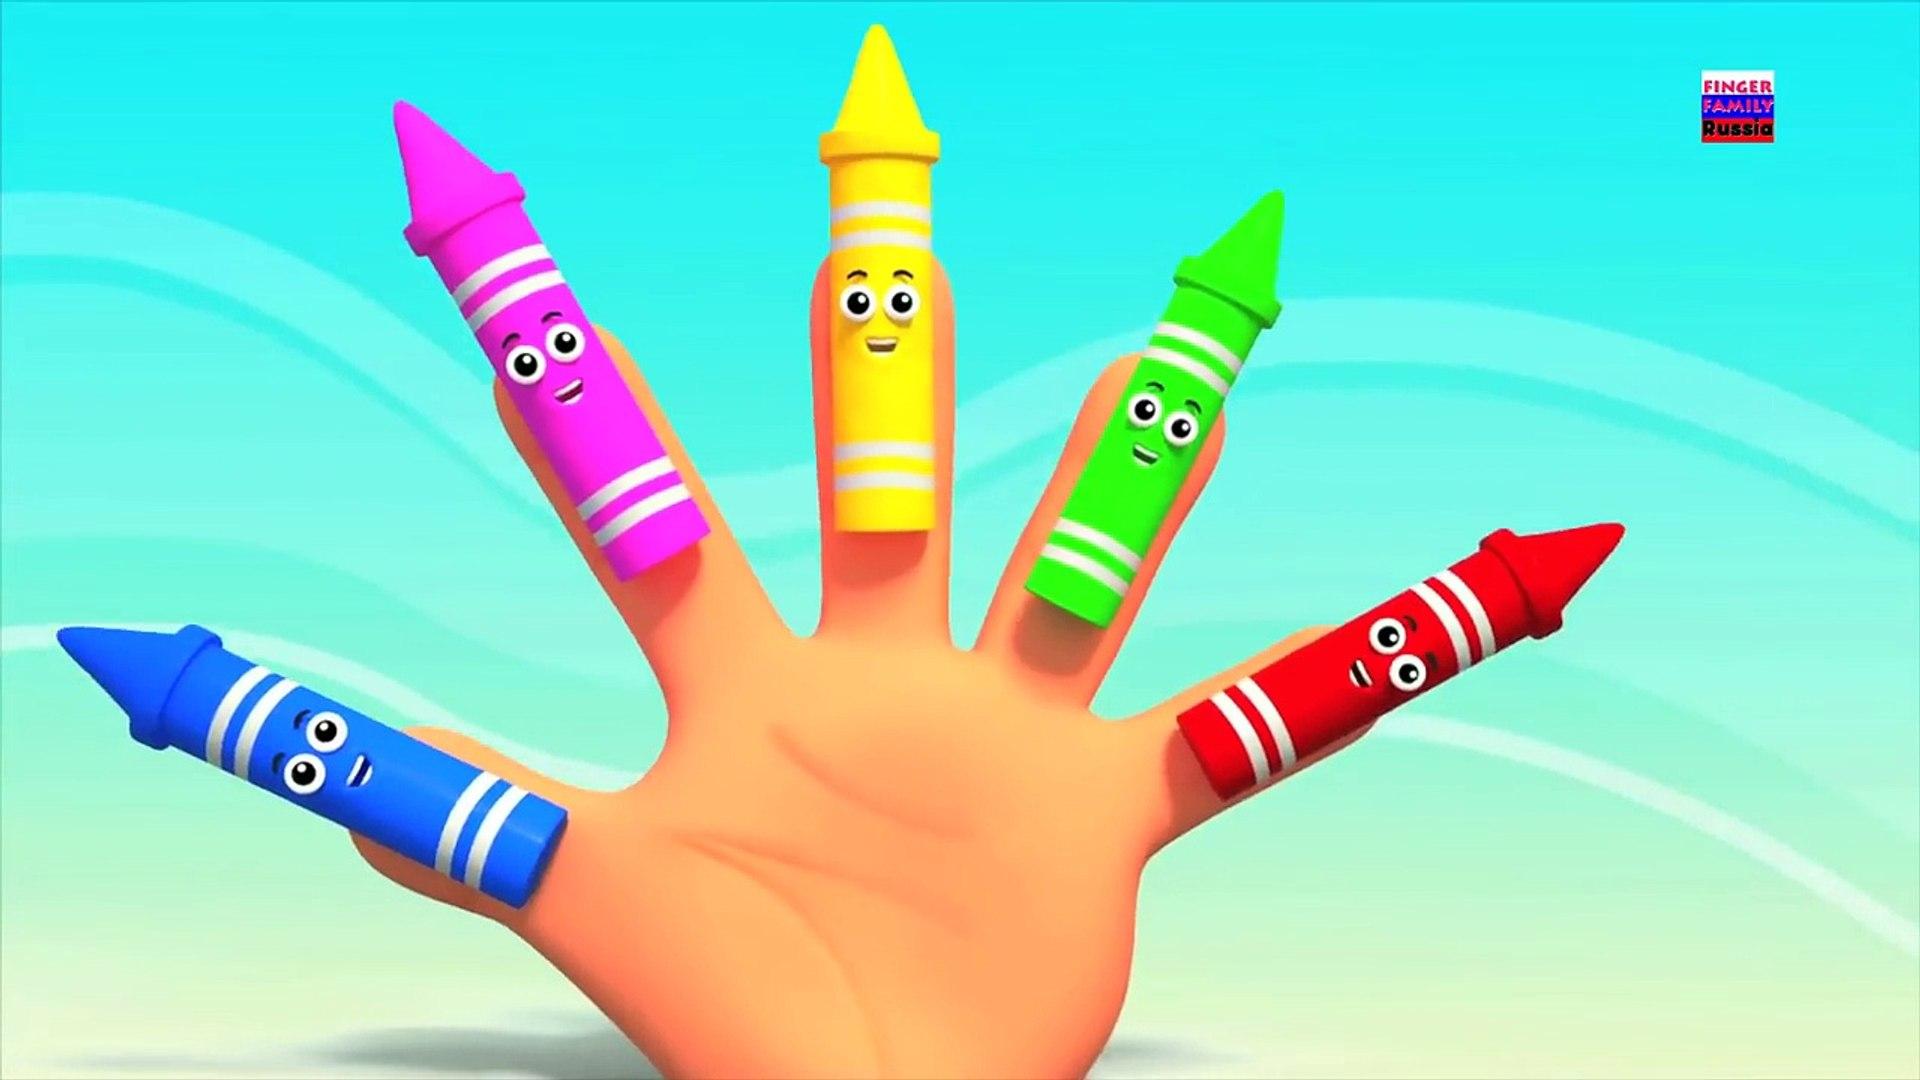 Овощи Палец семейство | 3d детские стишки | Песни для детей | 3D Rhymes | Vegetables Finger Family